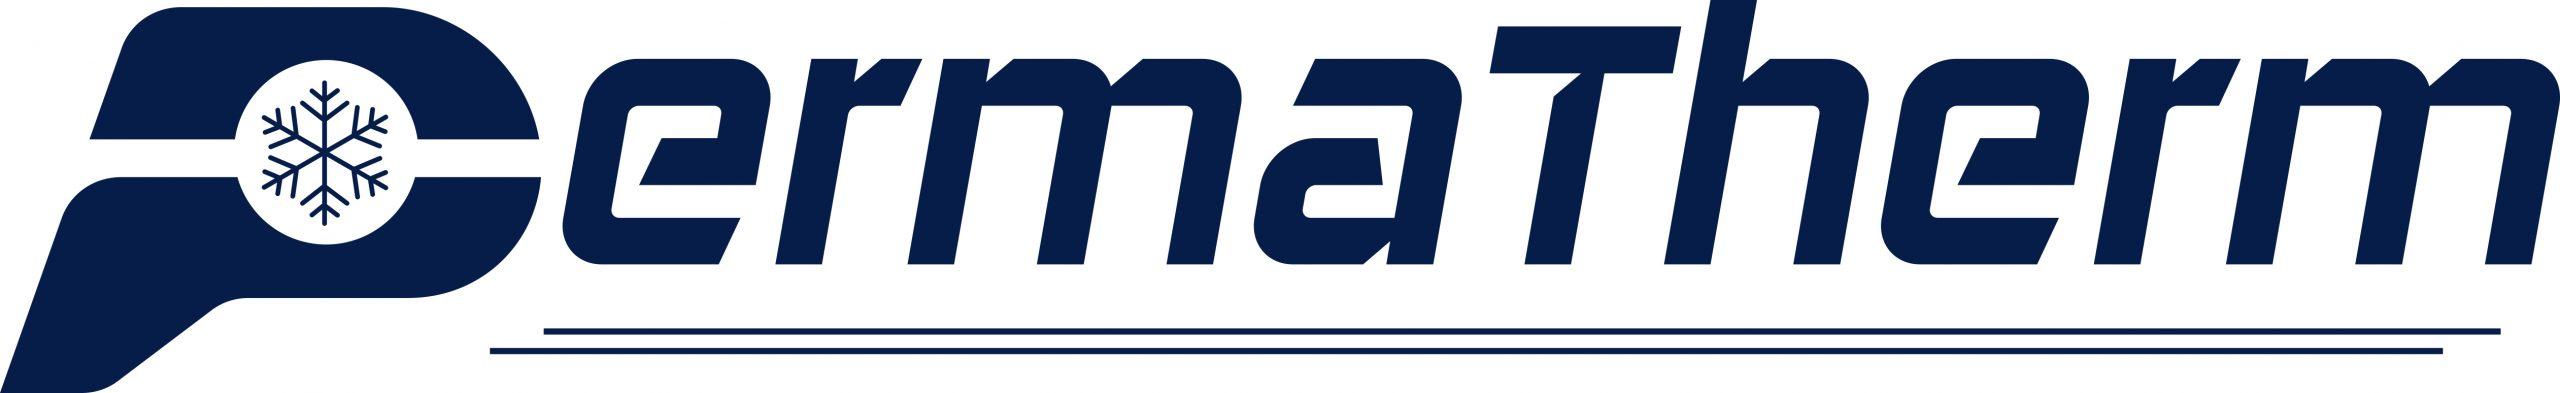 PermaTherm logo